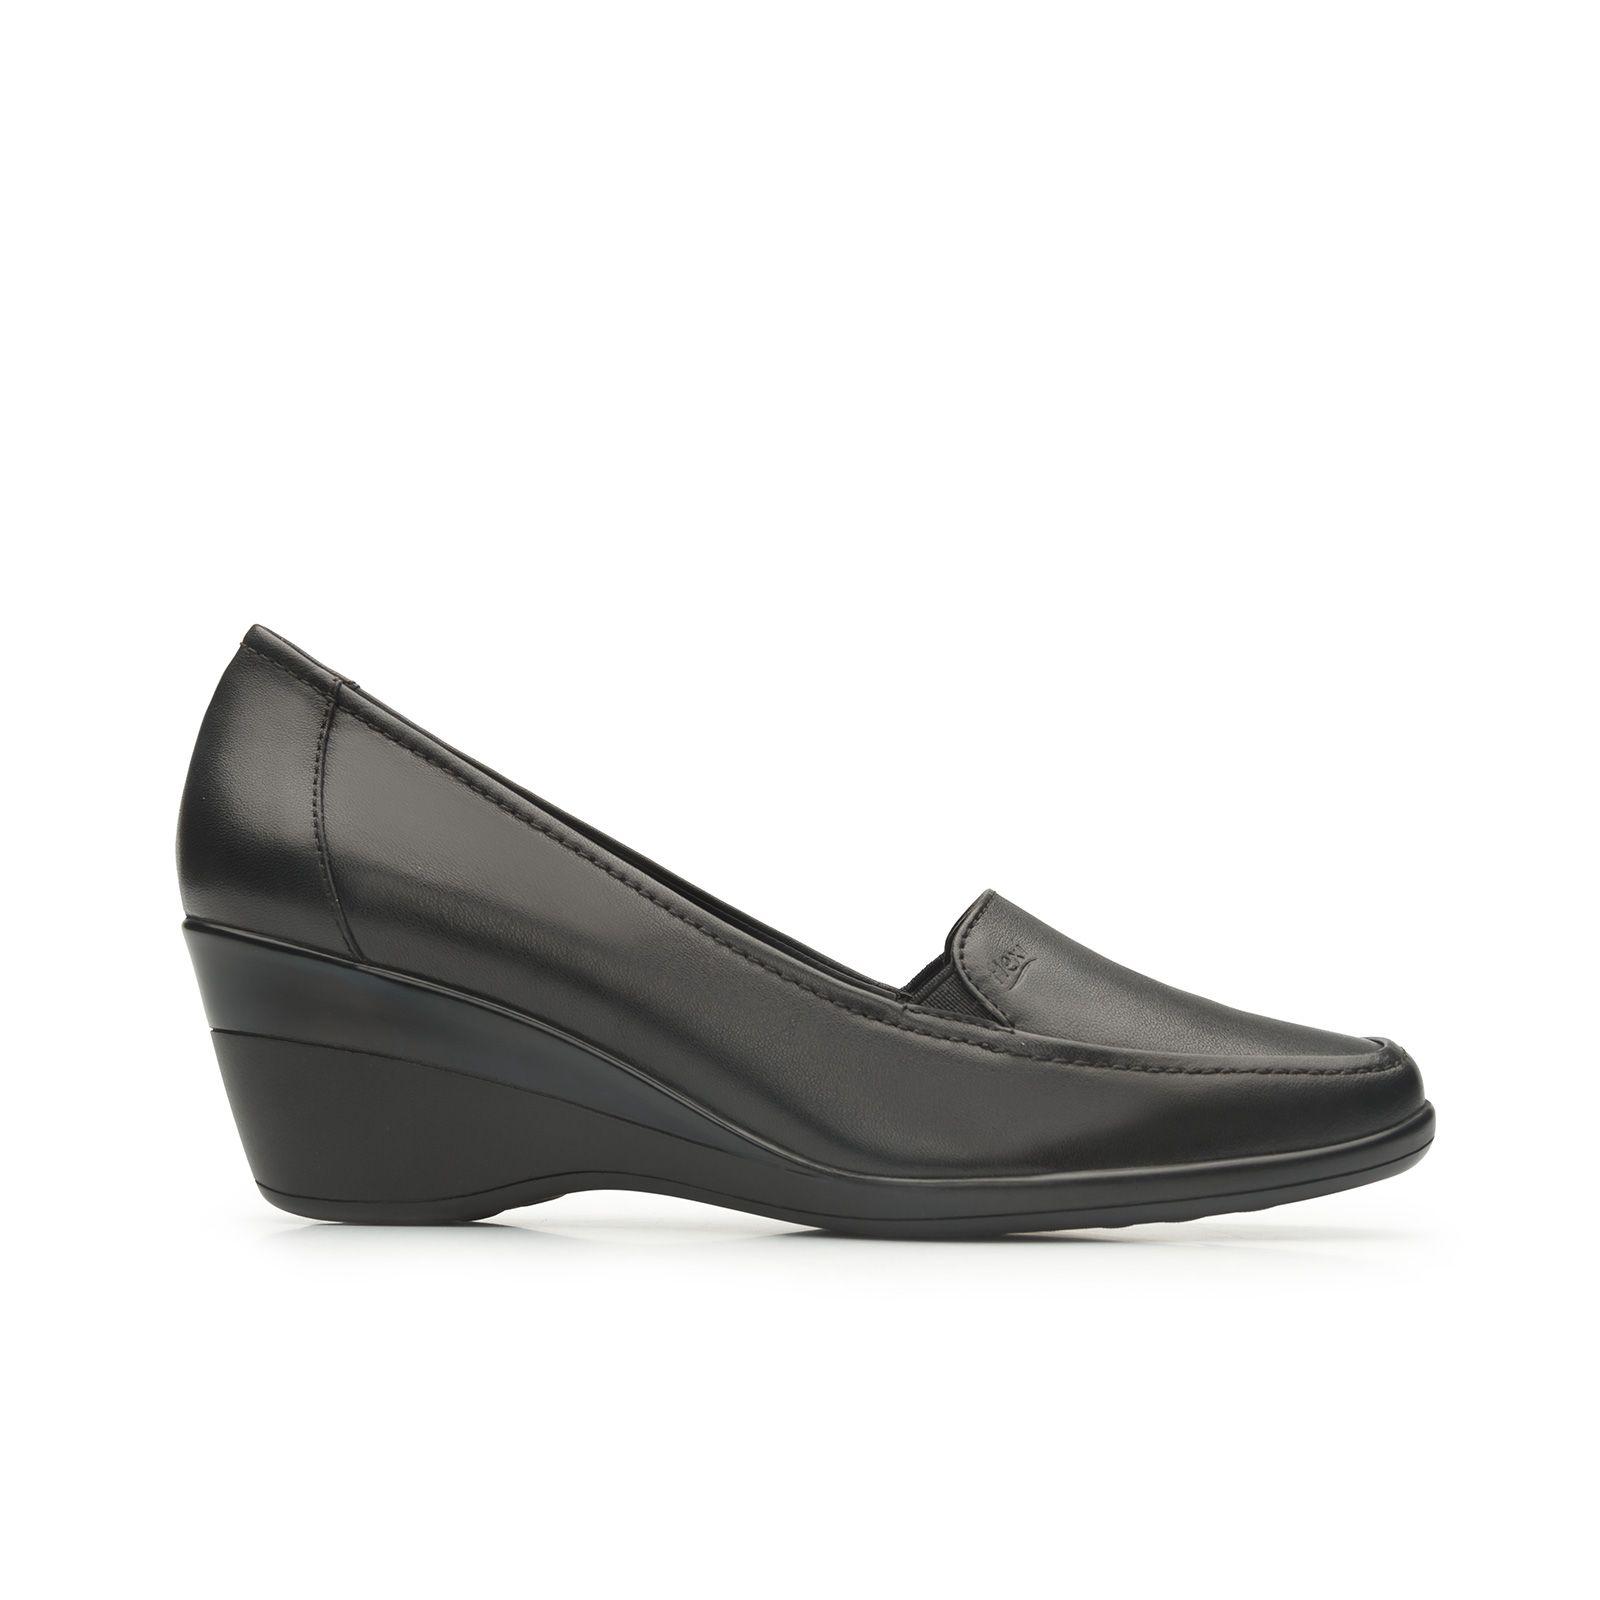 Estilo Flexi 15901 Negro - #shoes #zapatos #fashion #moda #goflexi #flexi #clothes #style #estilo #otono #invierno #autumn #winter